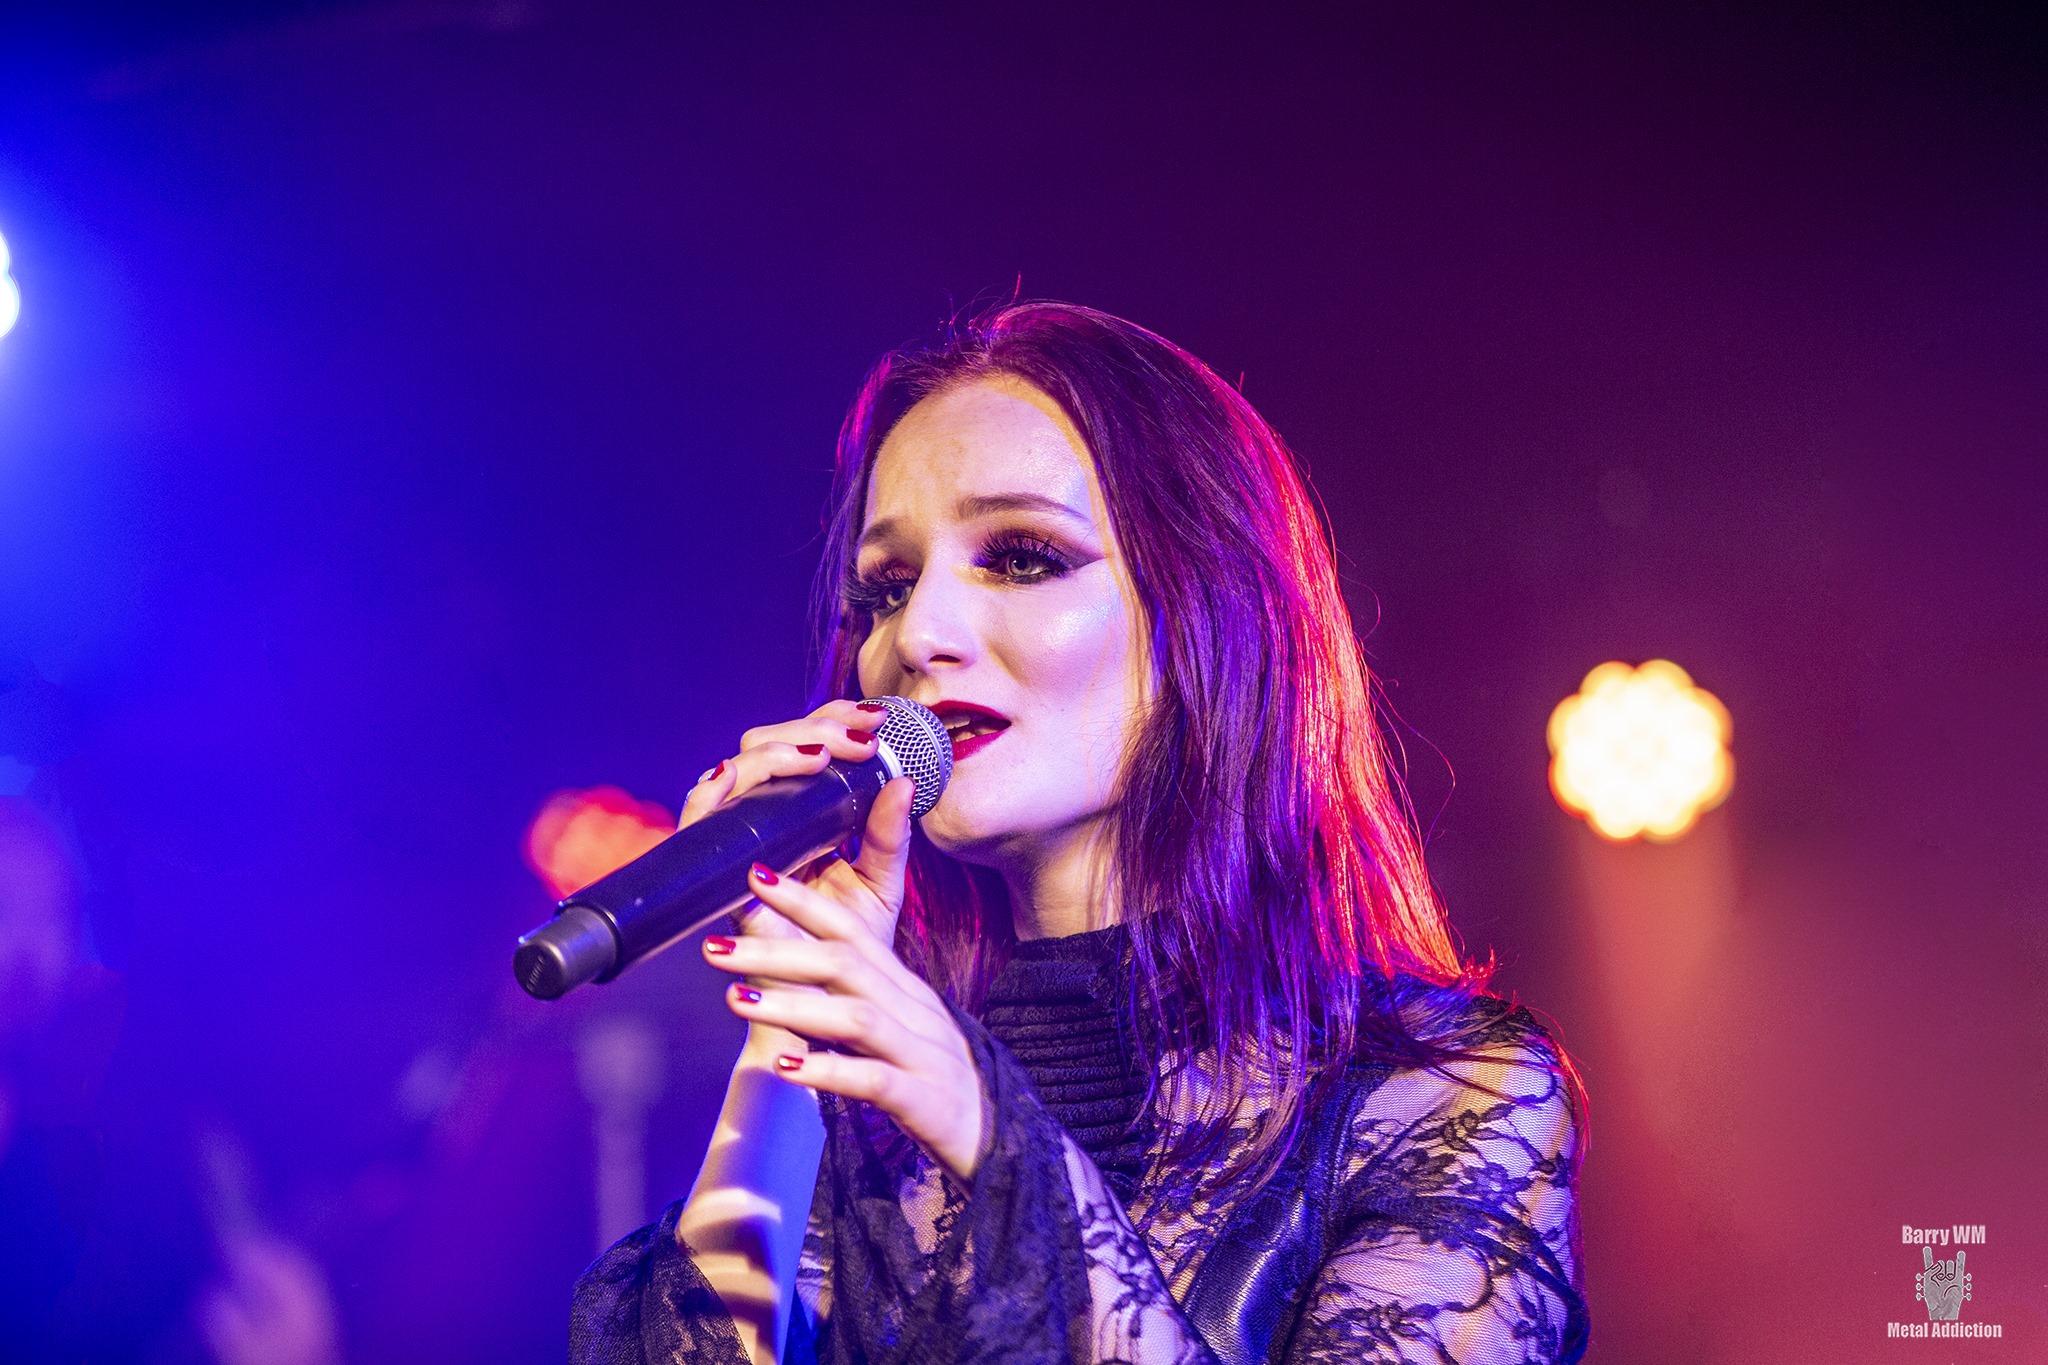 Penumbra female singer